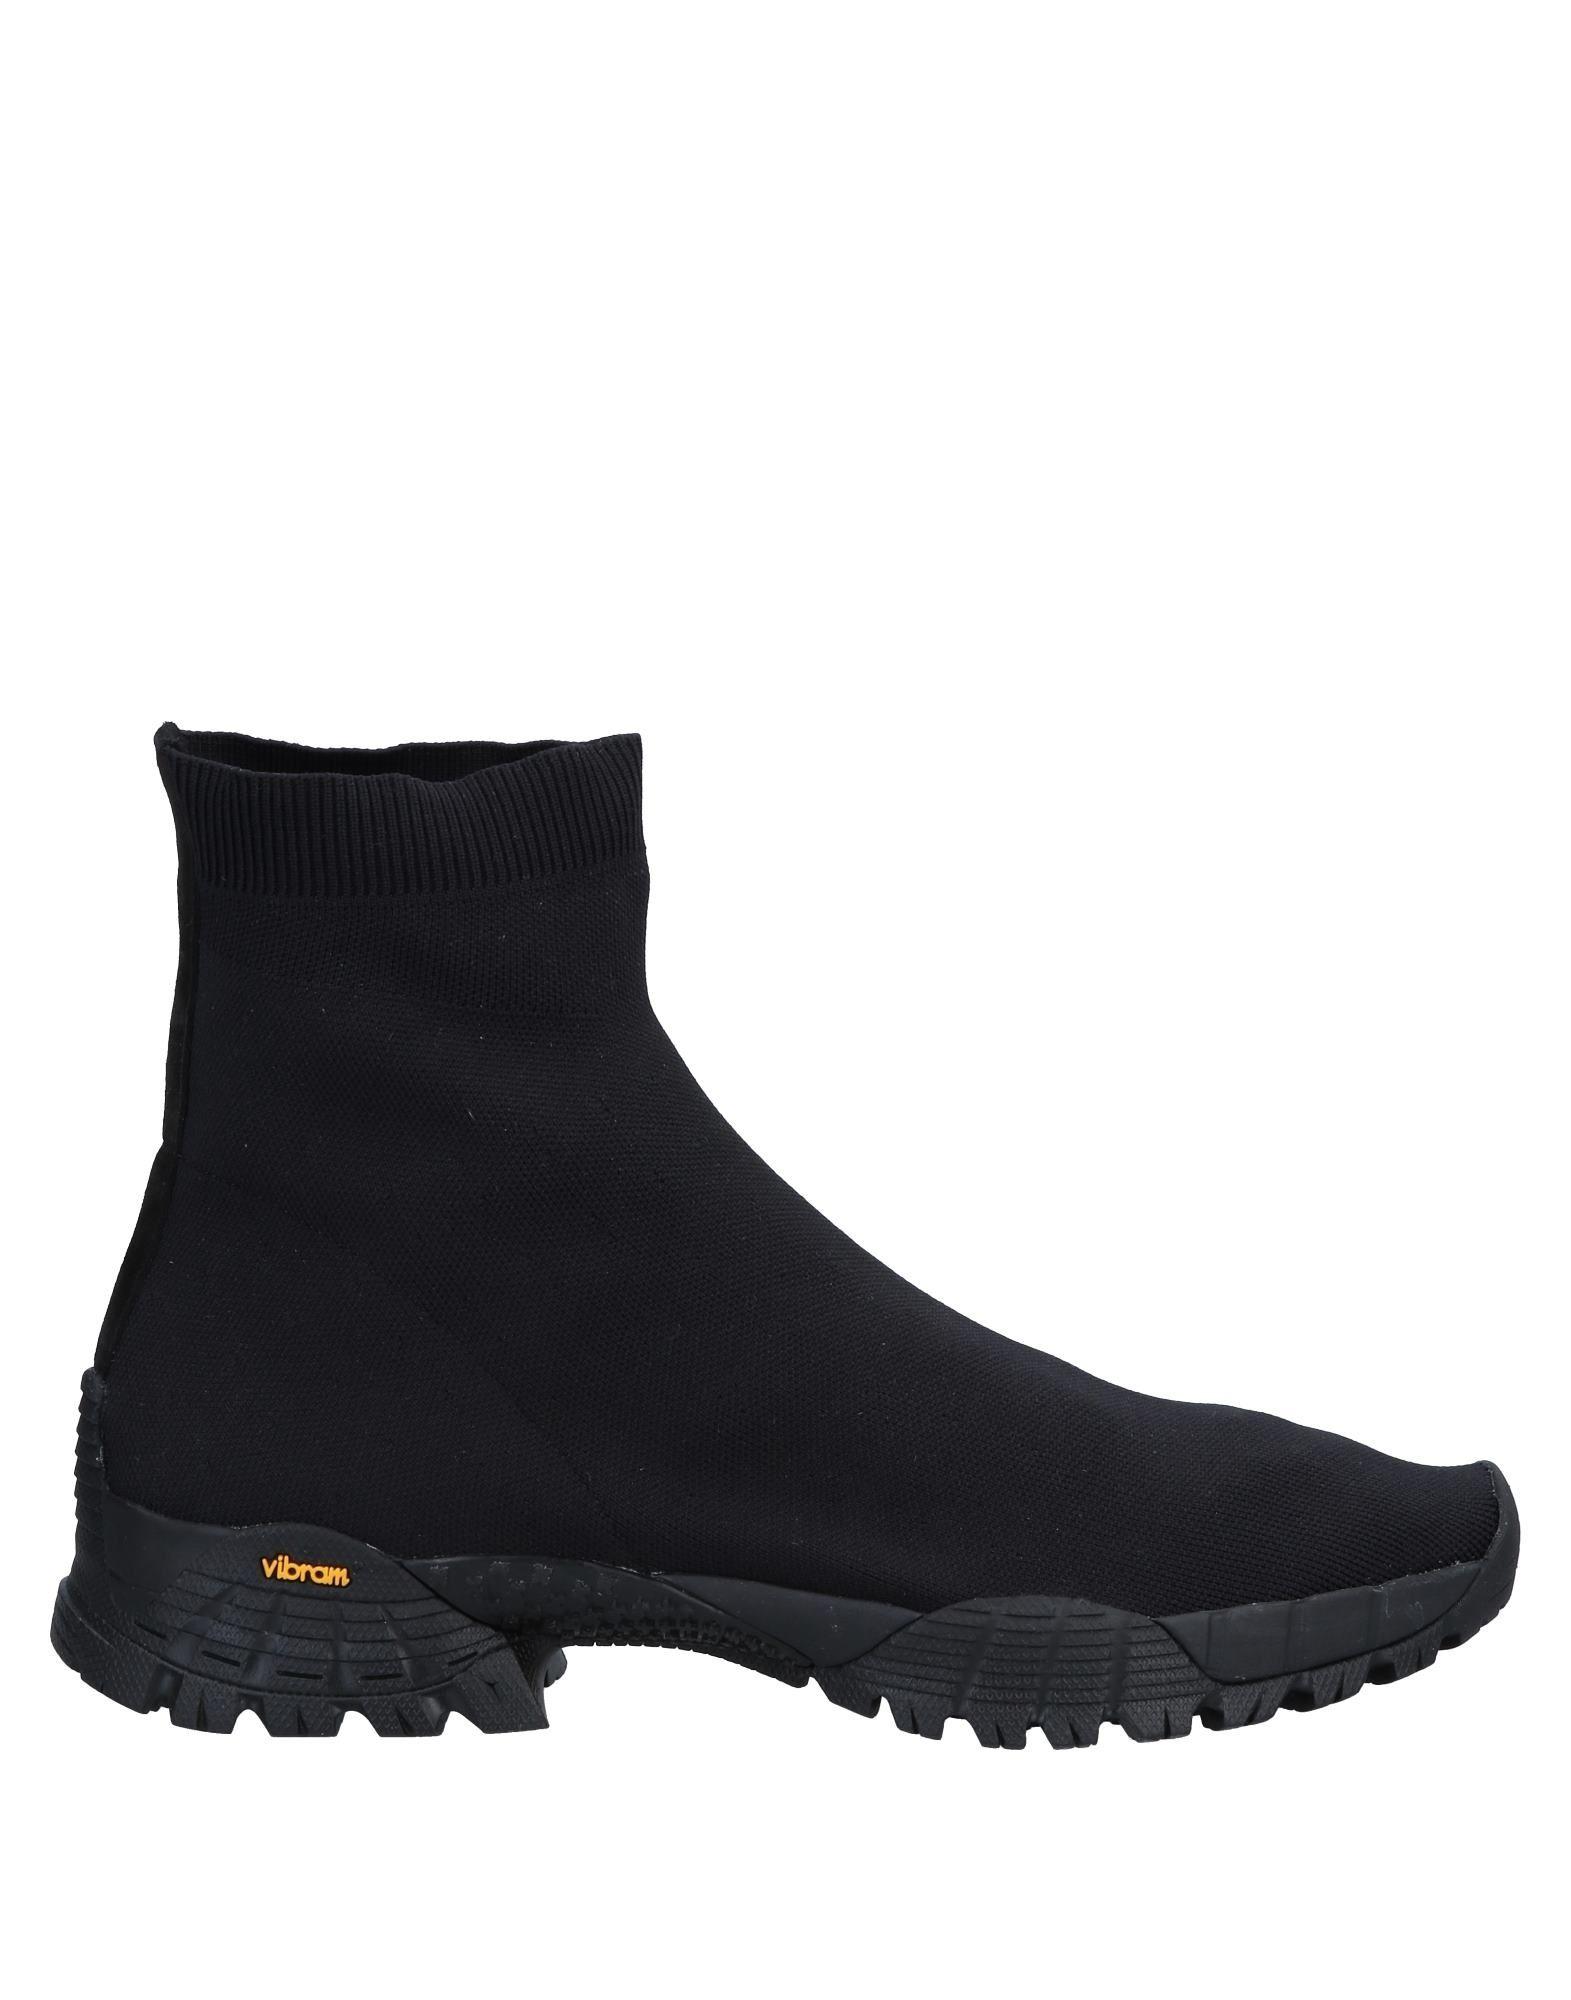 Alyx Boots - Men  Alyx Boots online on  Men Canada - 11566637KD 9b0925